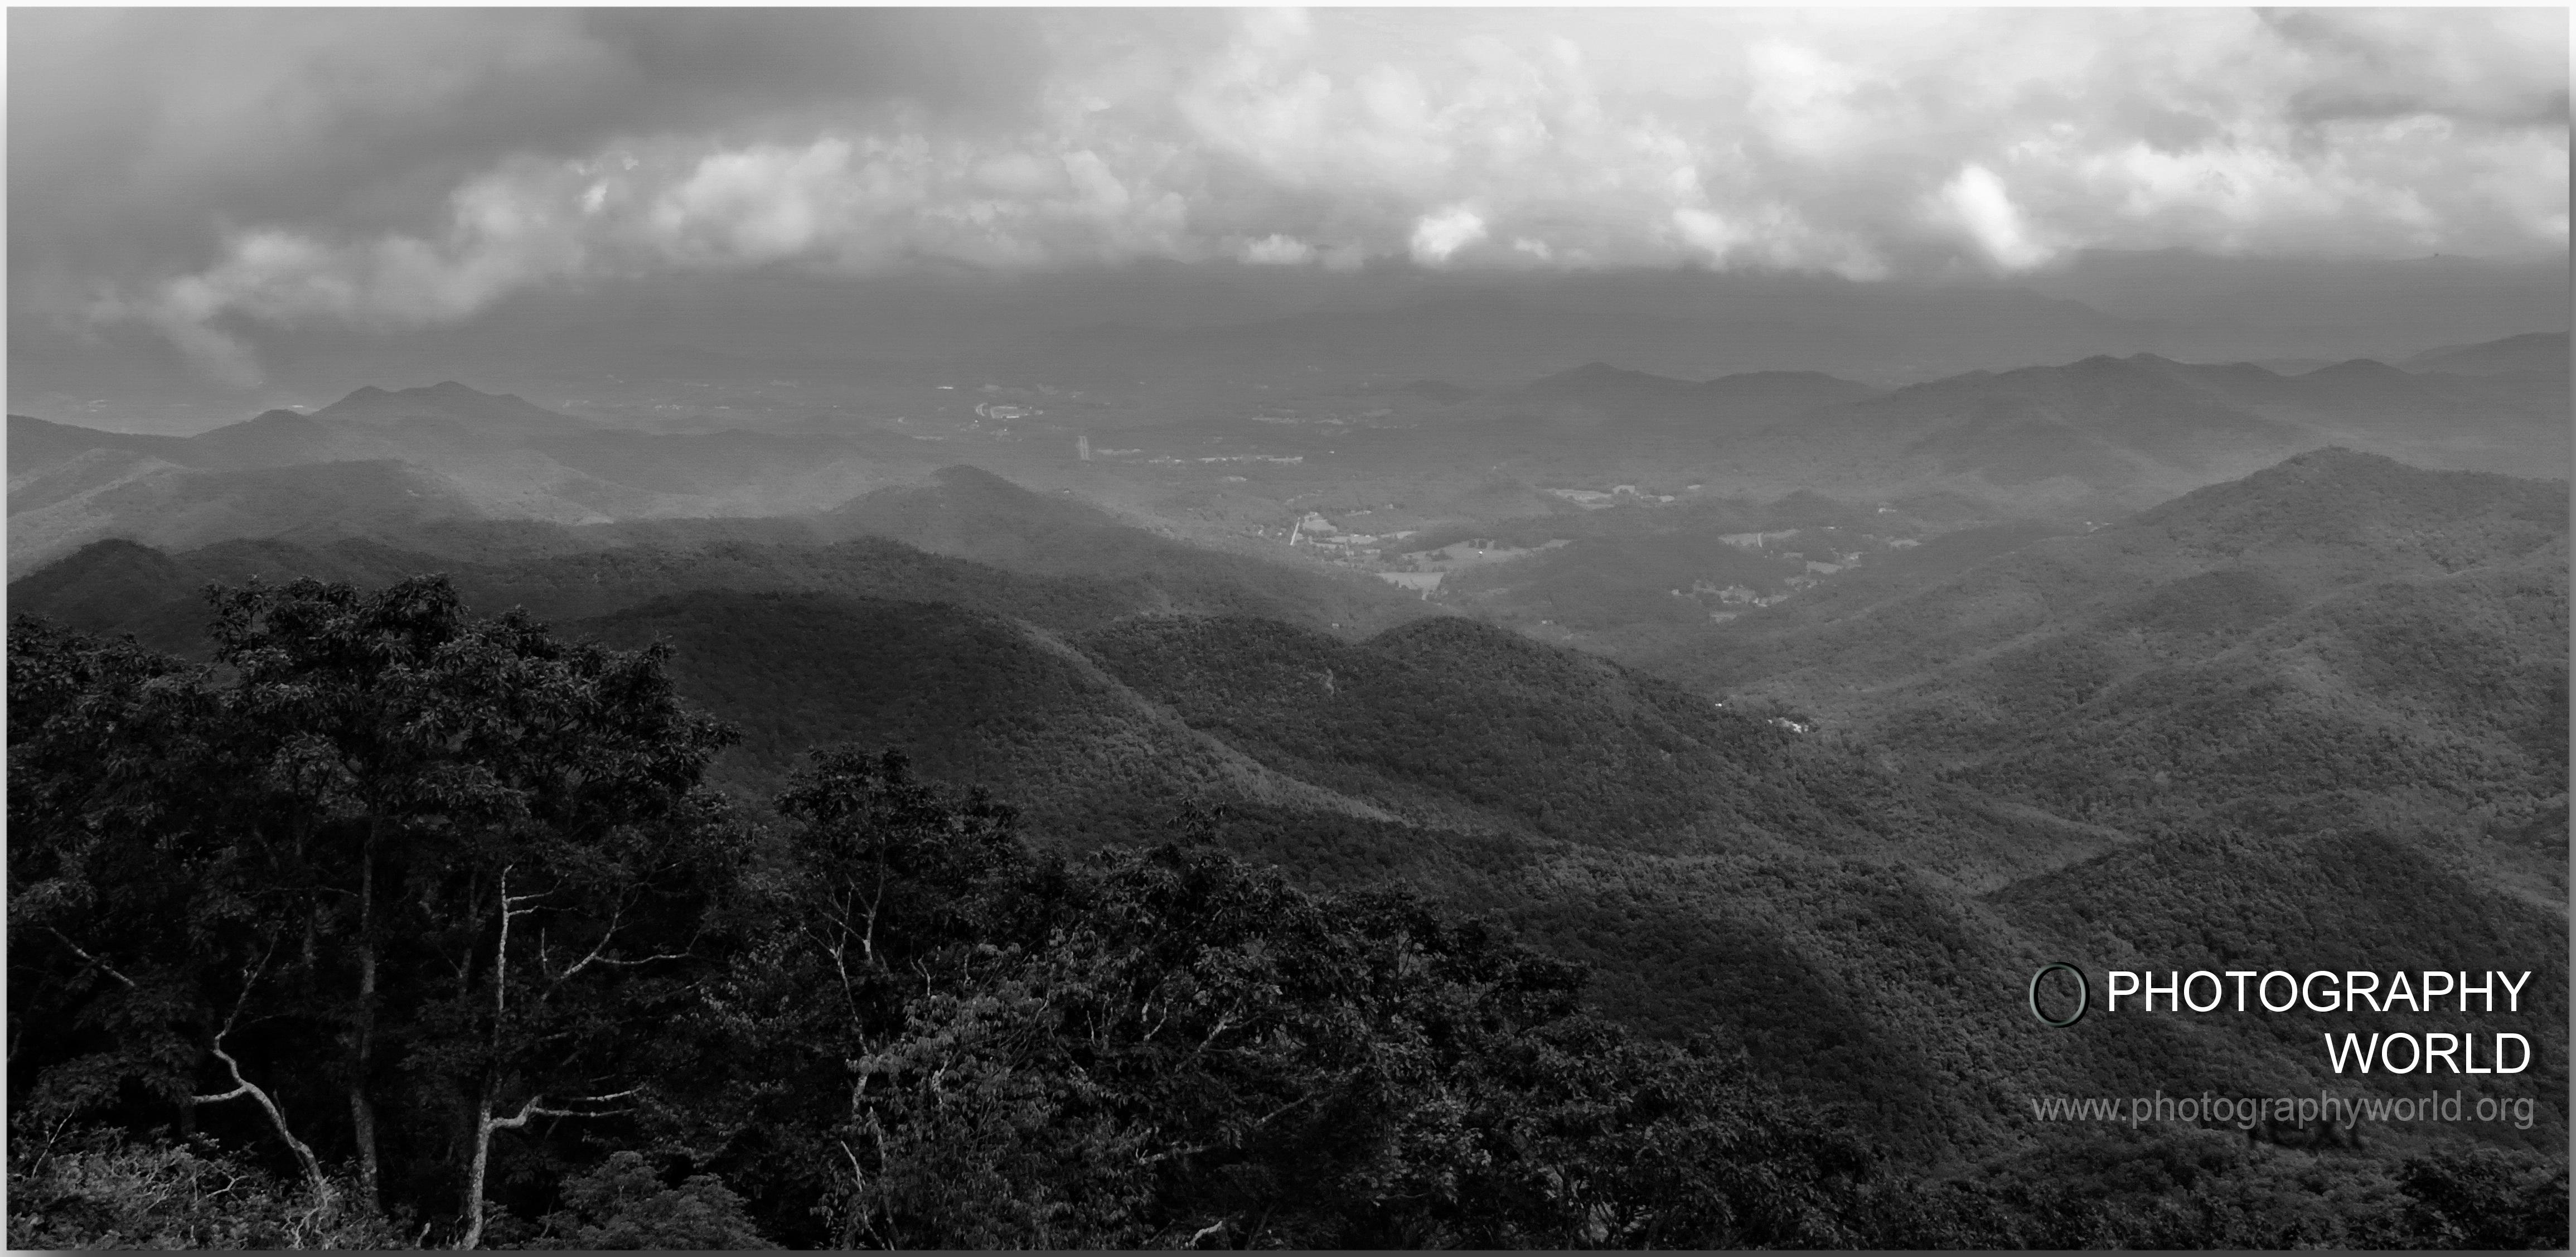 "© Wayah Bald Observation Tower looking towards NC & TN Smoky Mountains. August 2015 Photograph by Mina Thevenin. Photography World article: ""APPALACHIAN TRAIL|Take a Walk on the Wild Side|Nantahala|Tellico Gap to Wayah Bald"" photographyworld.org"